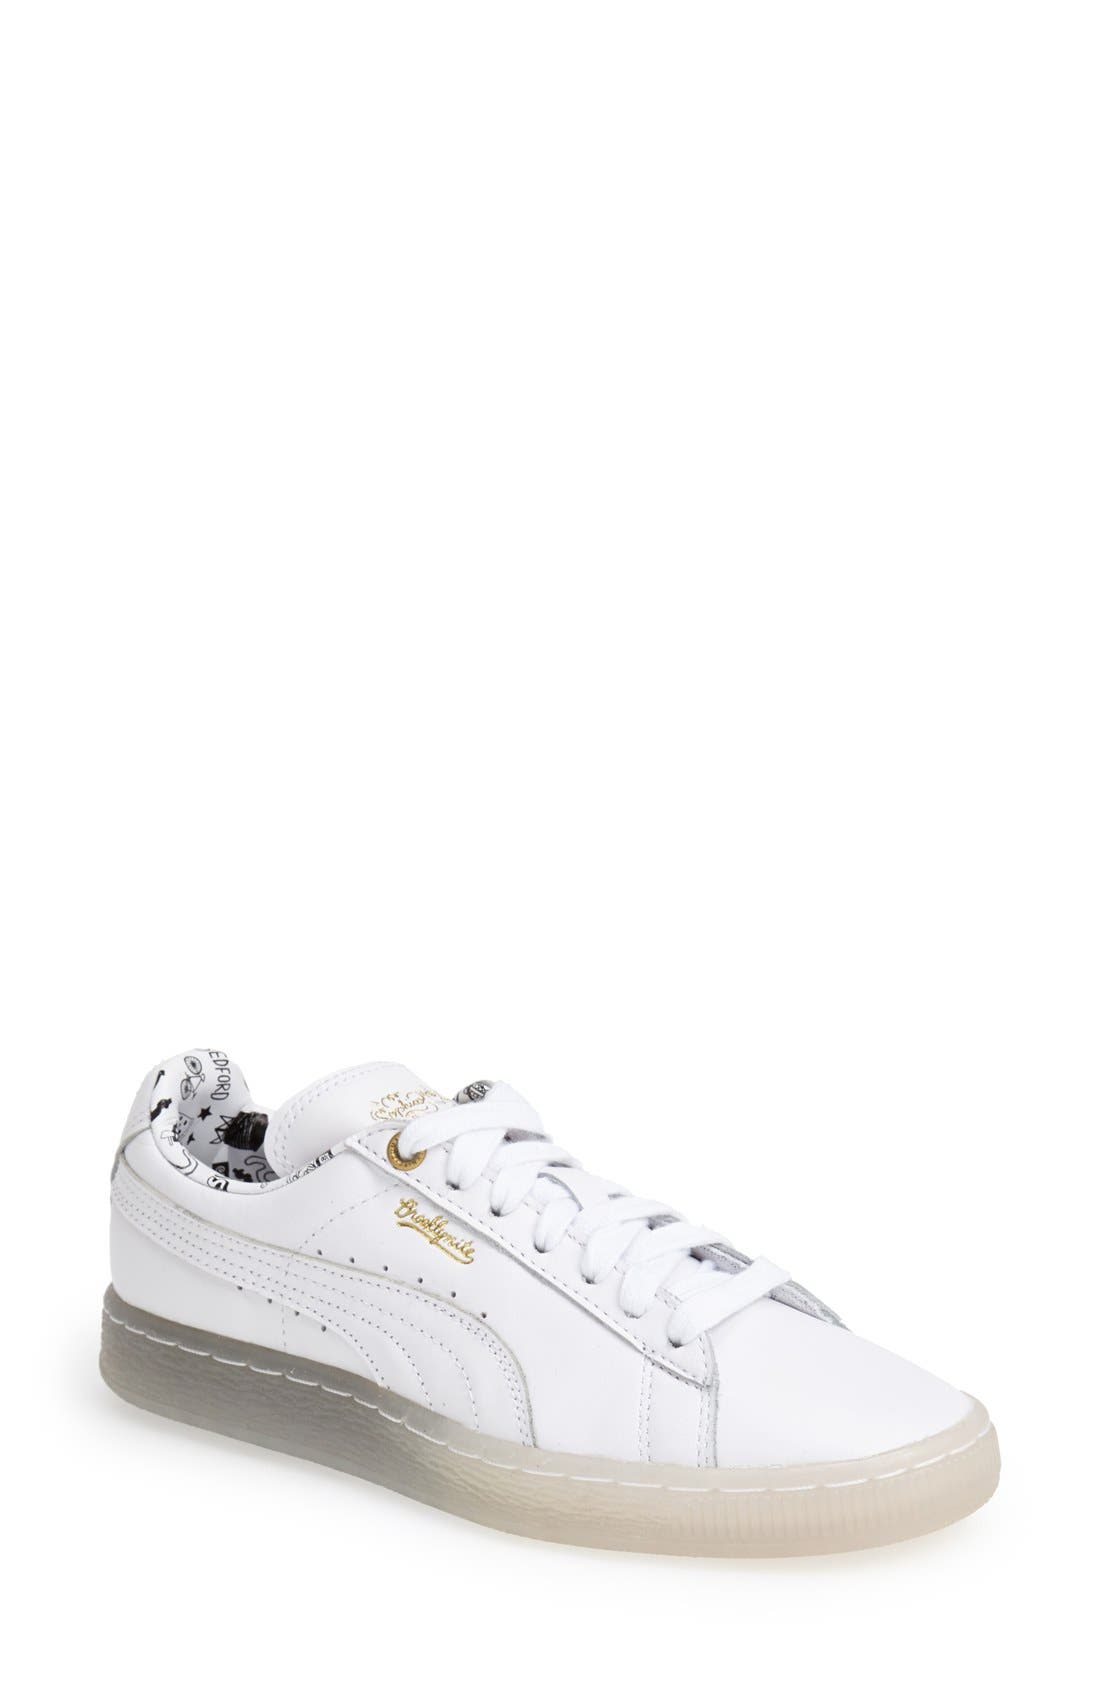 Alternate Image 1 Selected - PUMA 'Brooklynite - Sophia Chang' Classic Sneaker (Women)